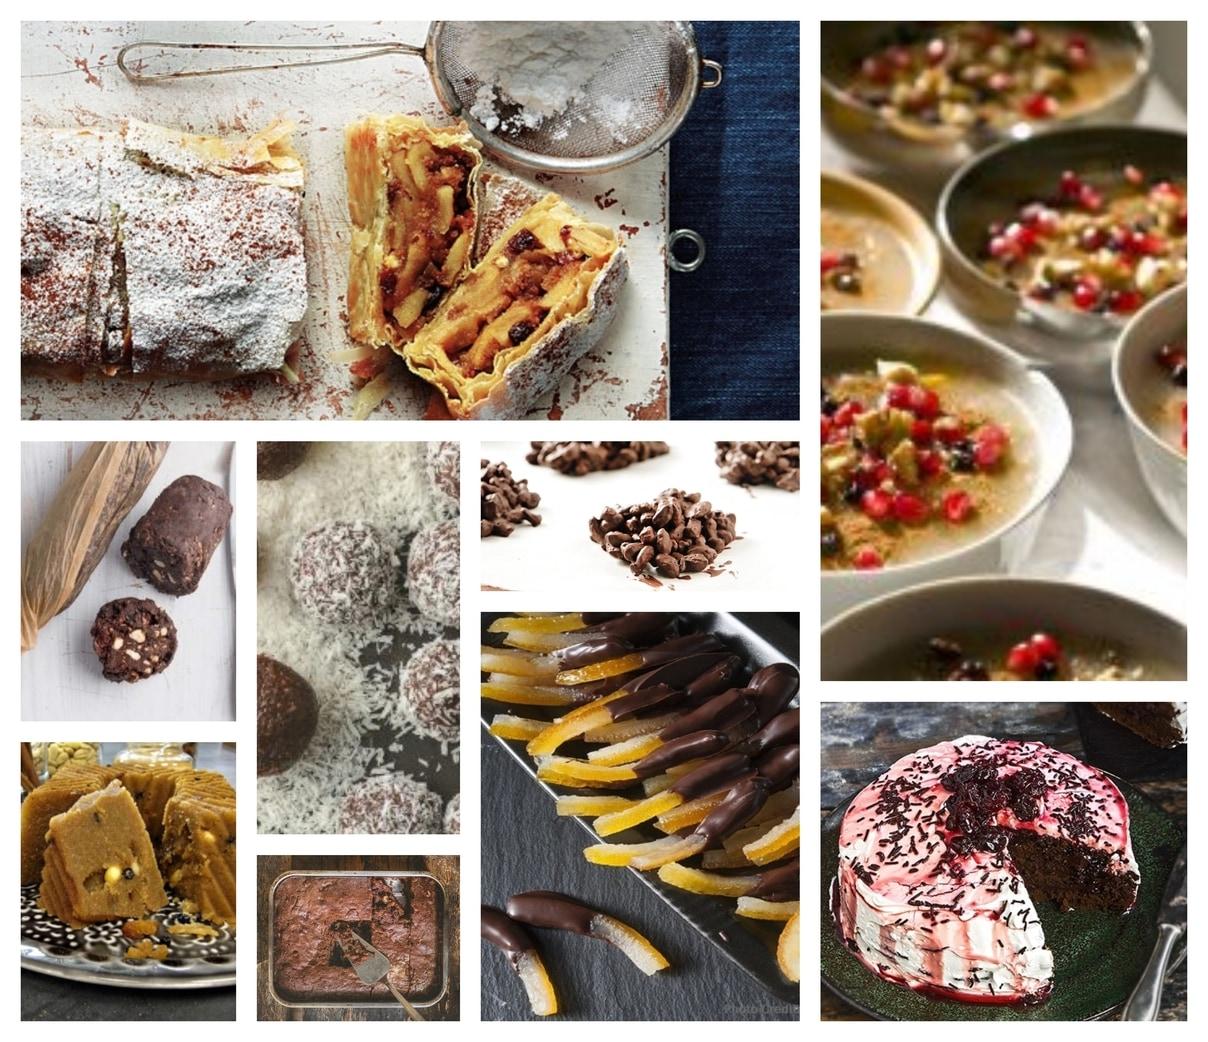 Vegan γλυκά: Οι καλύτερες συνταγές-featured_image